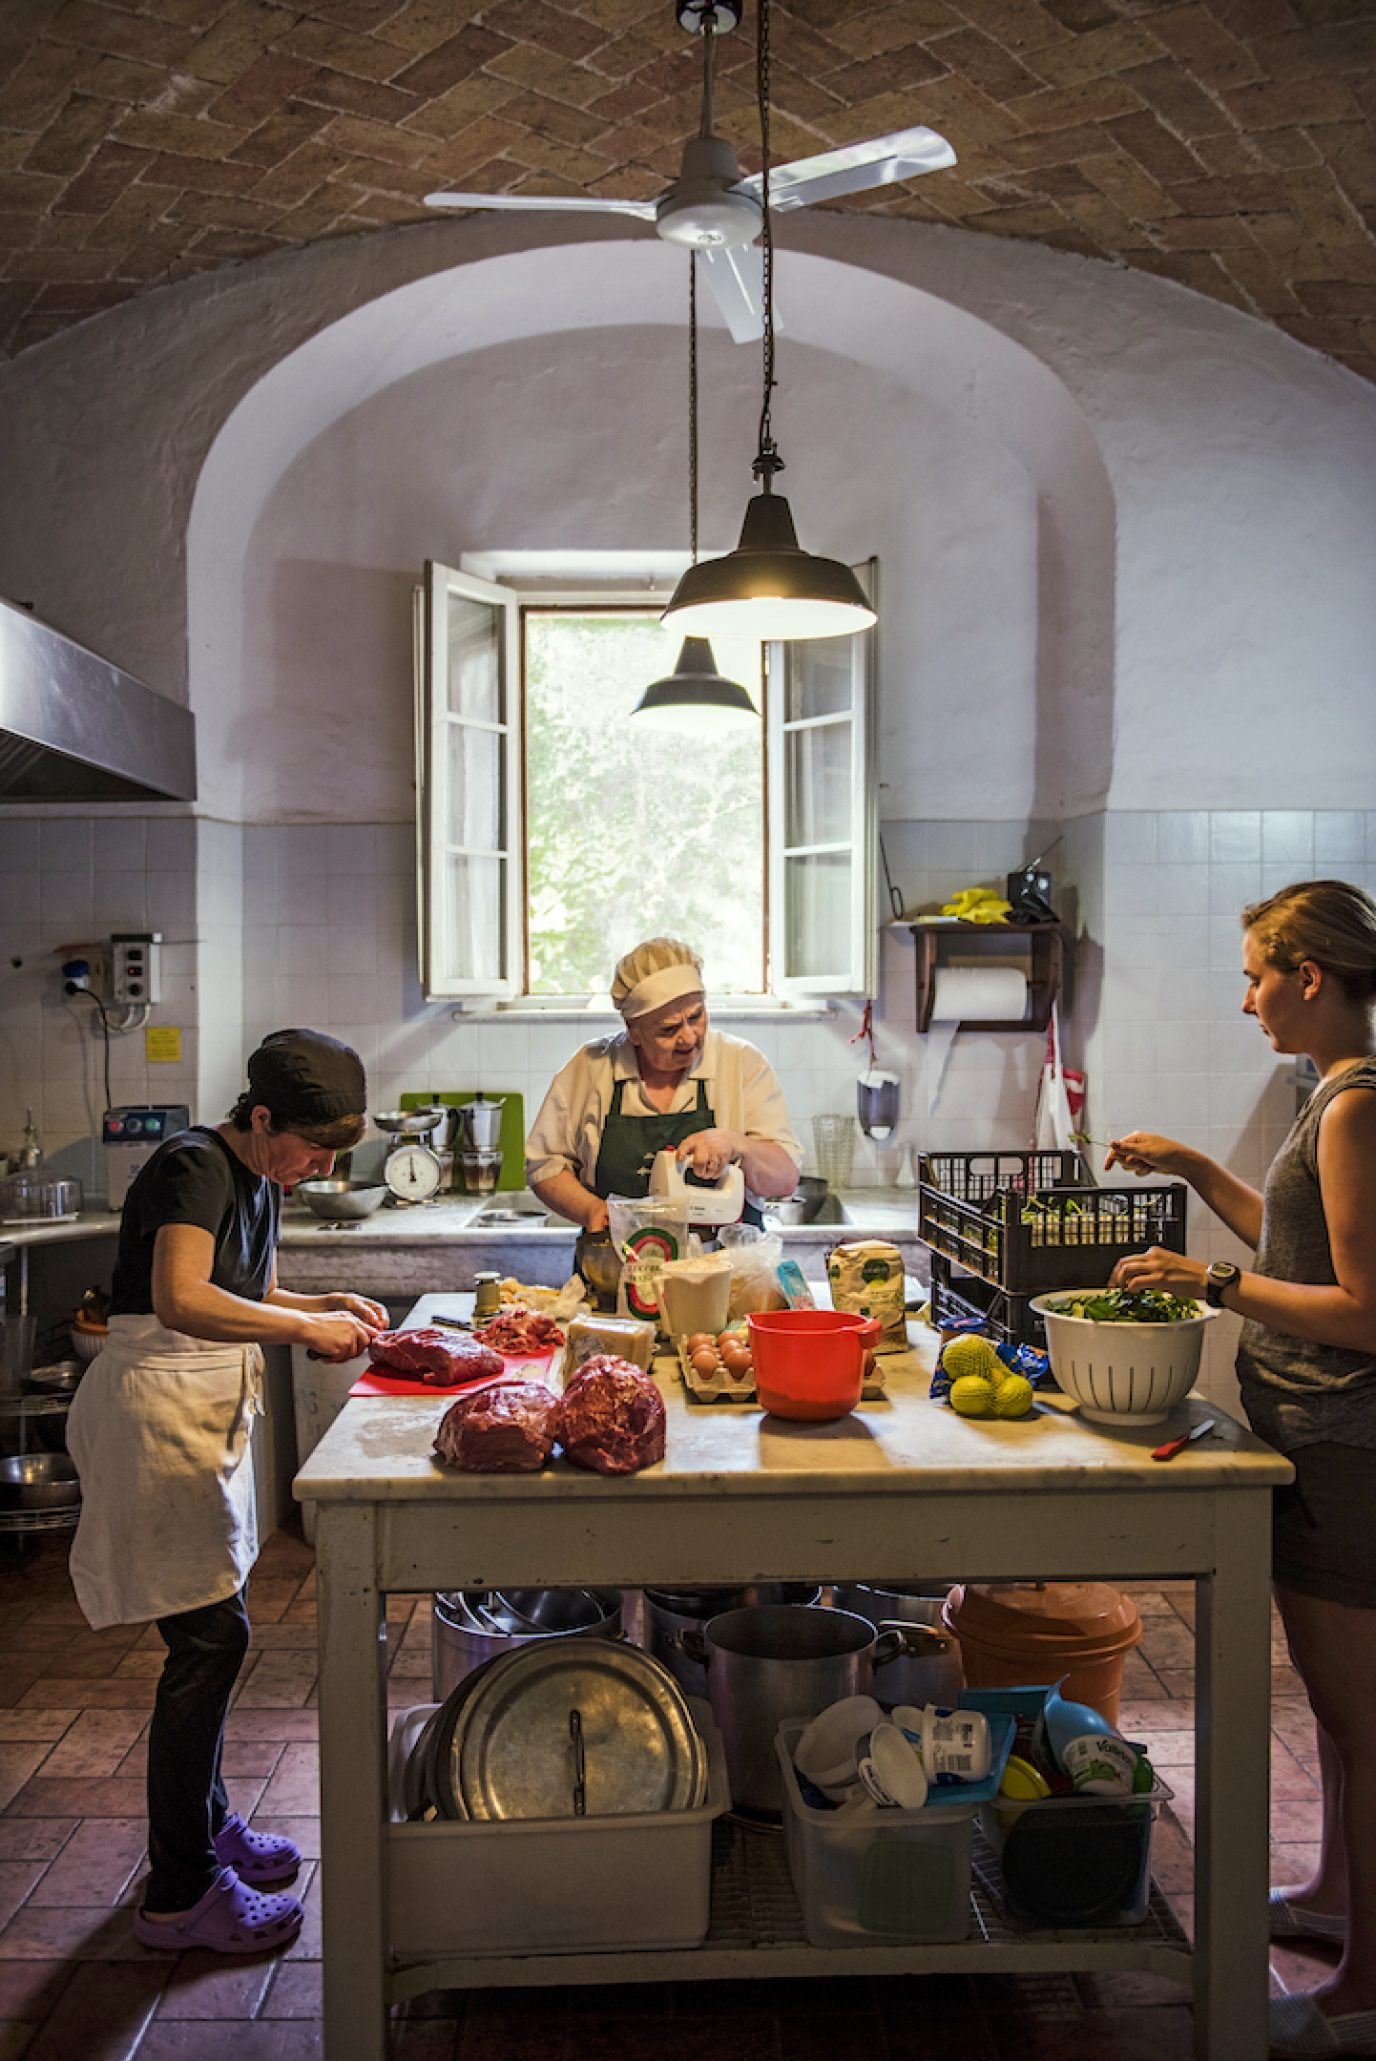 Cooking in the Kitchen, Tenuta di Spannocchia, Siena, Tuscany, Italy.